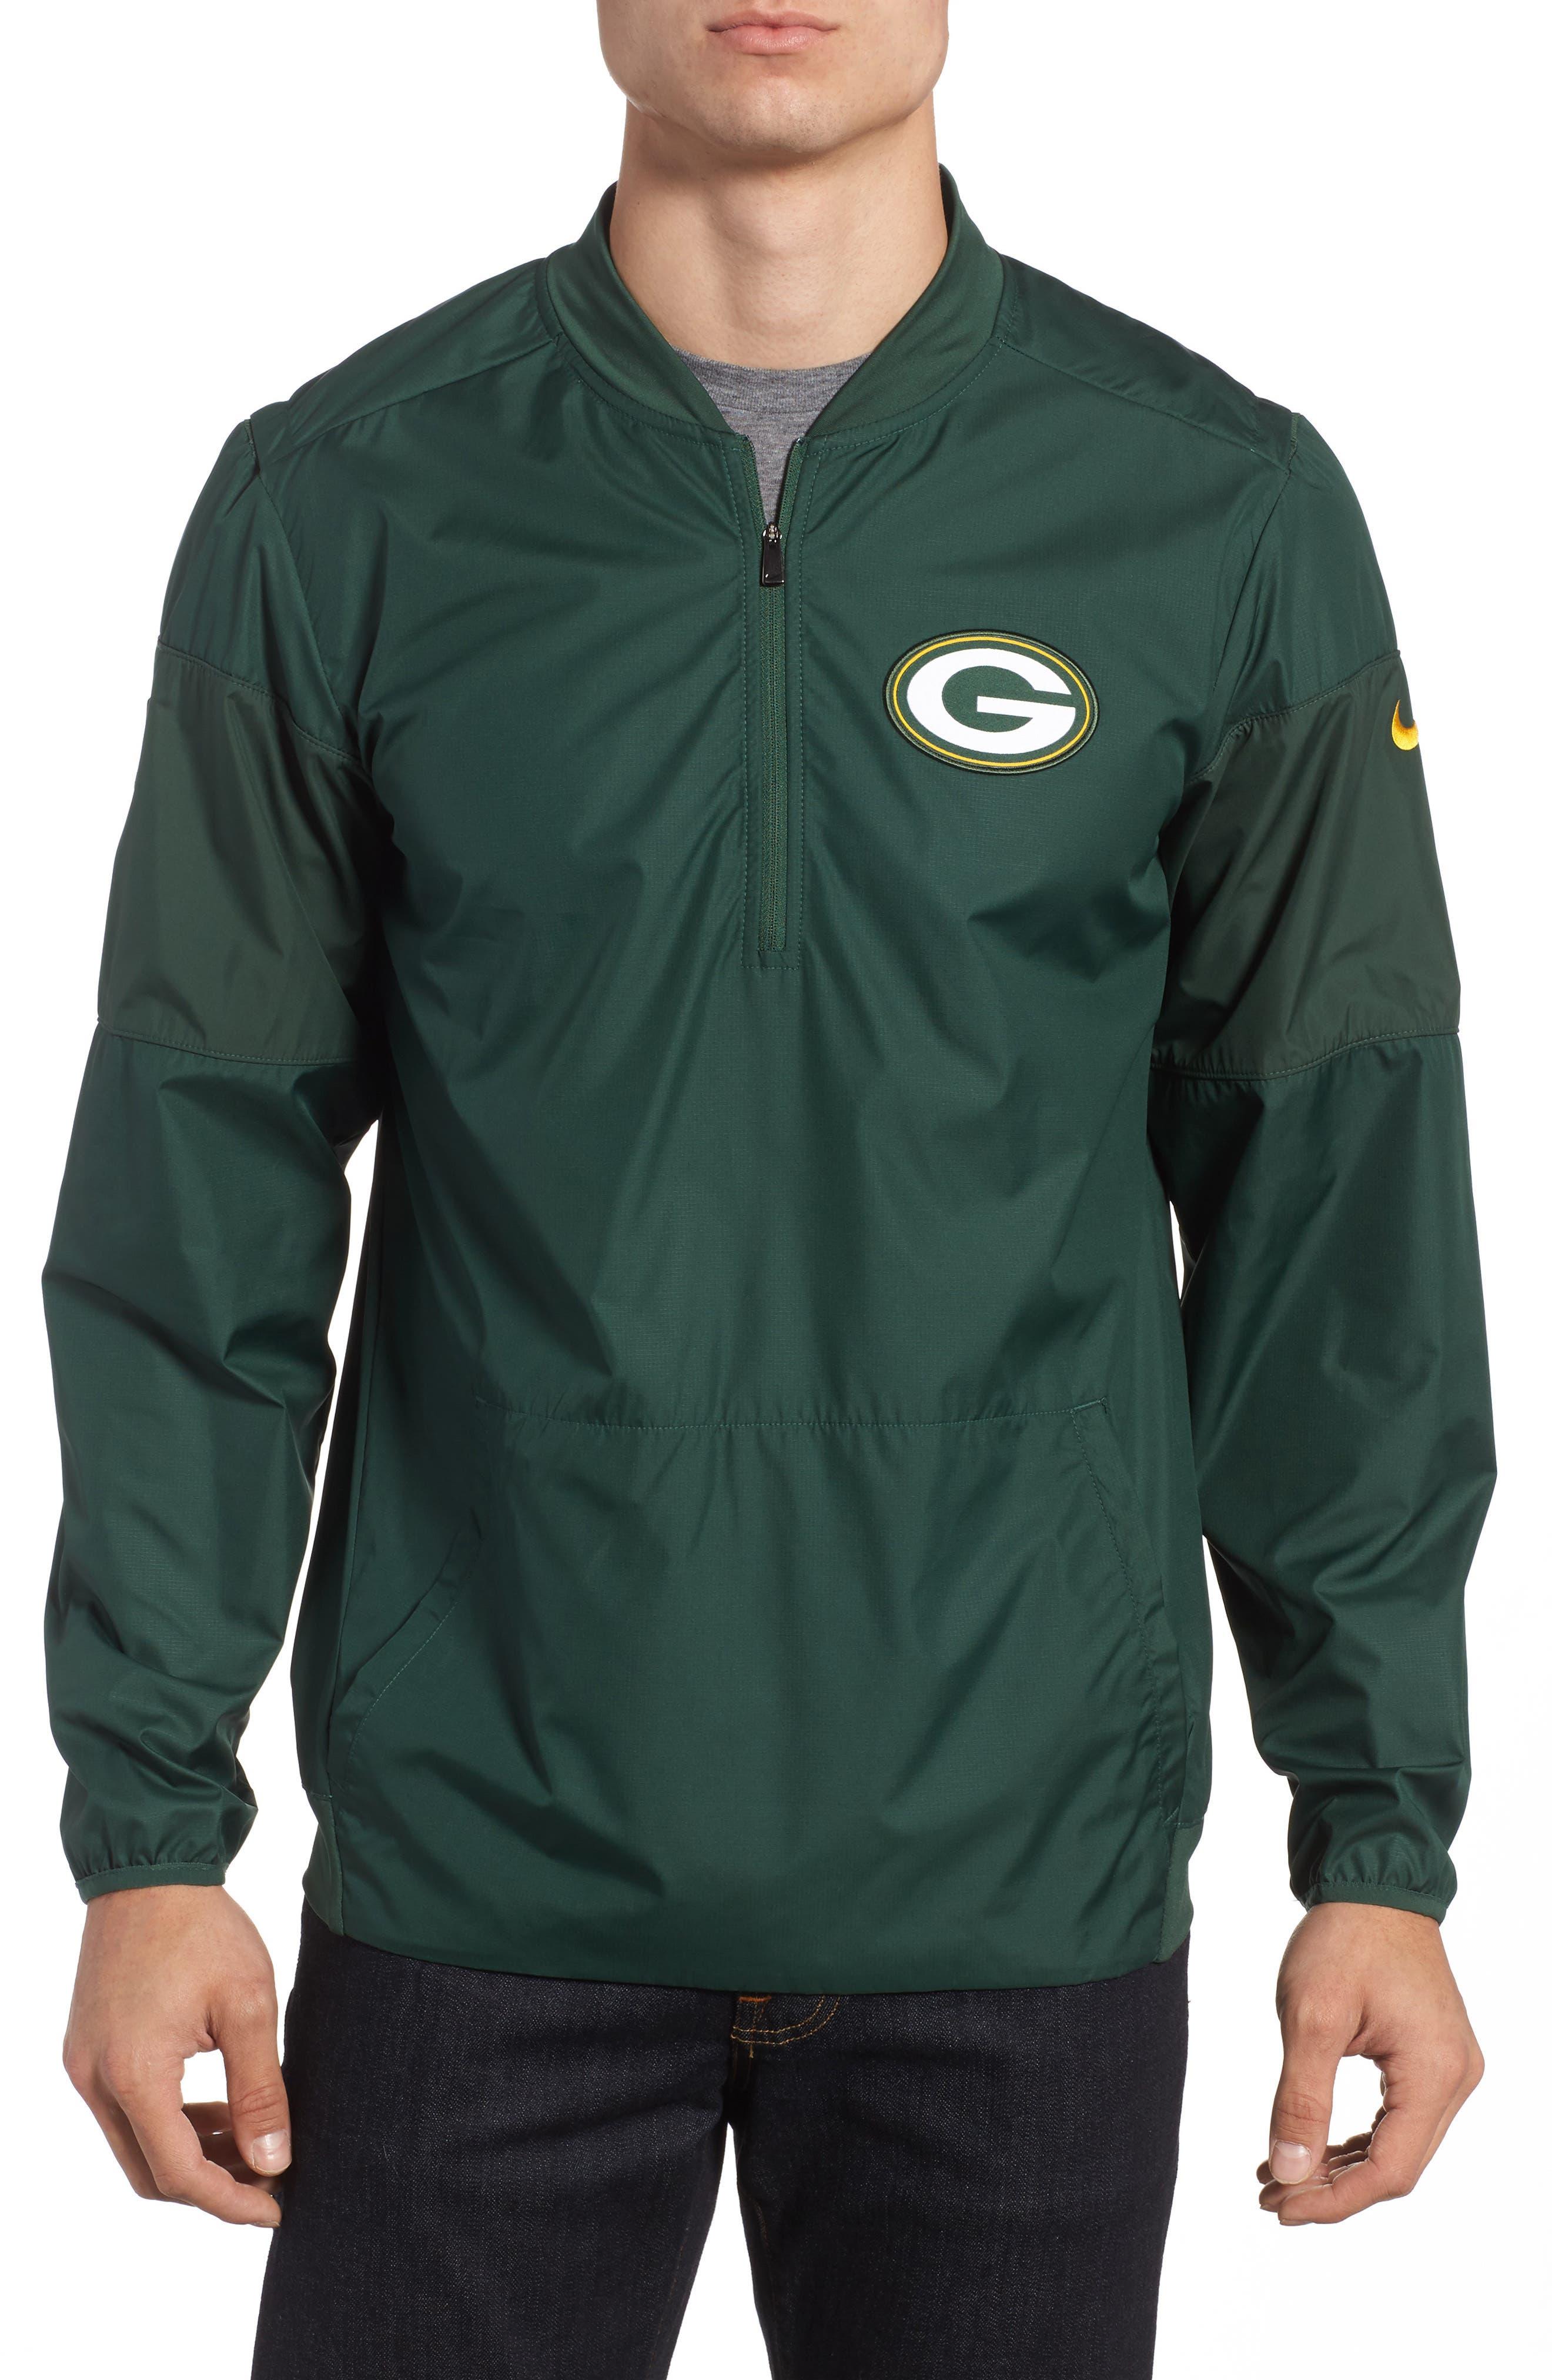 Nike Lockdown NFL Pullover Jacket